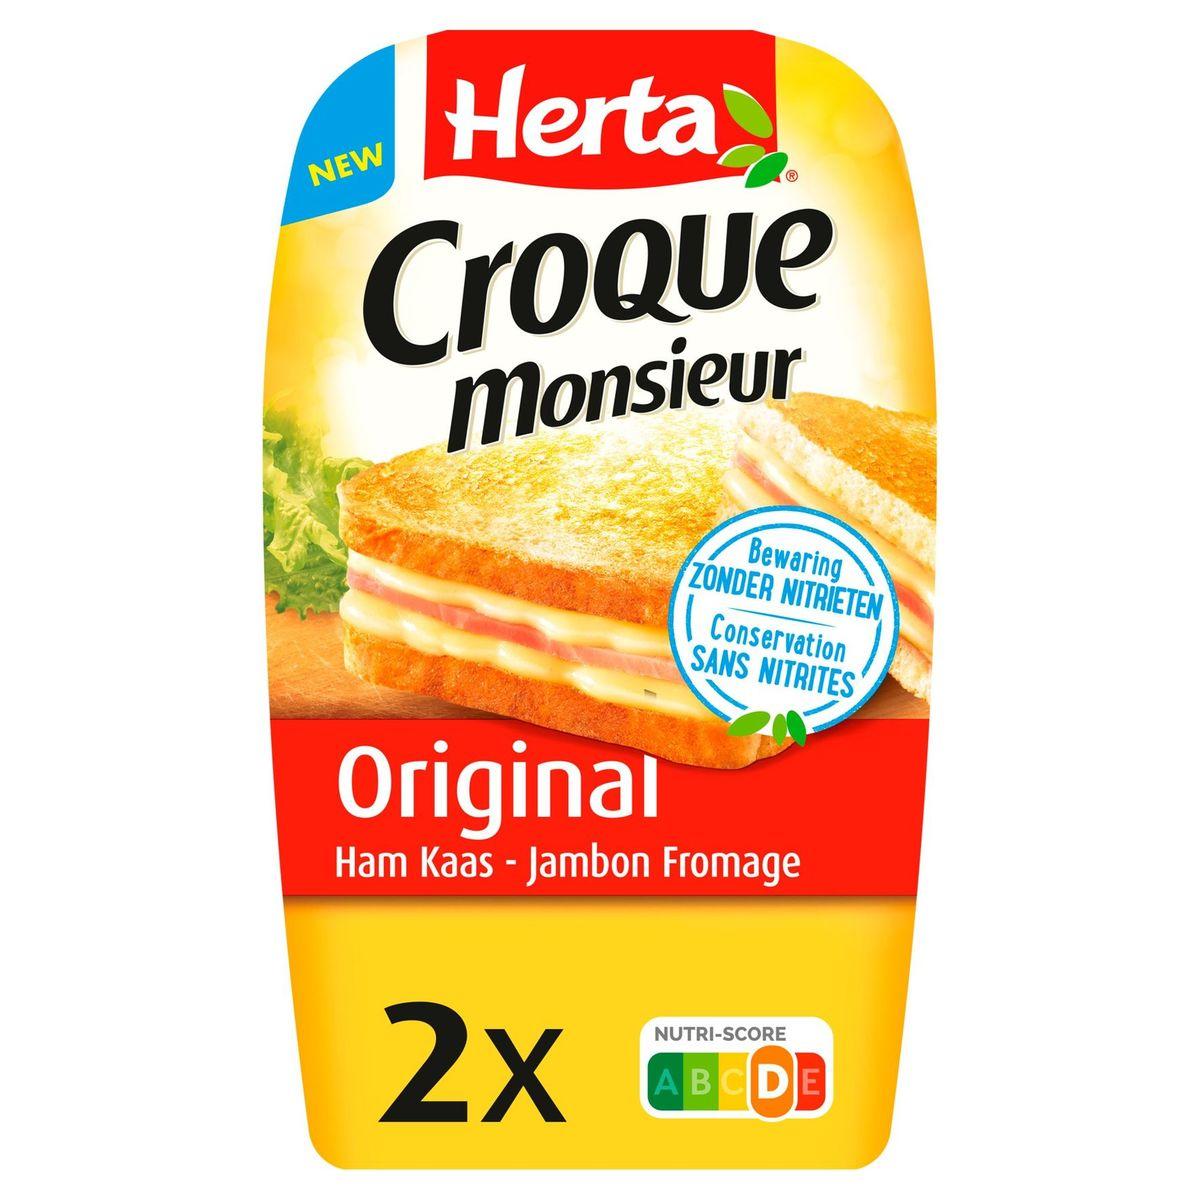 Herta Croque Monsieur Original Jambon Fromage 200 g